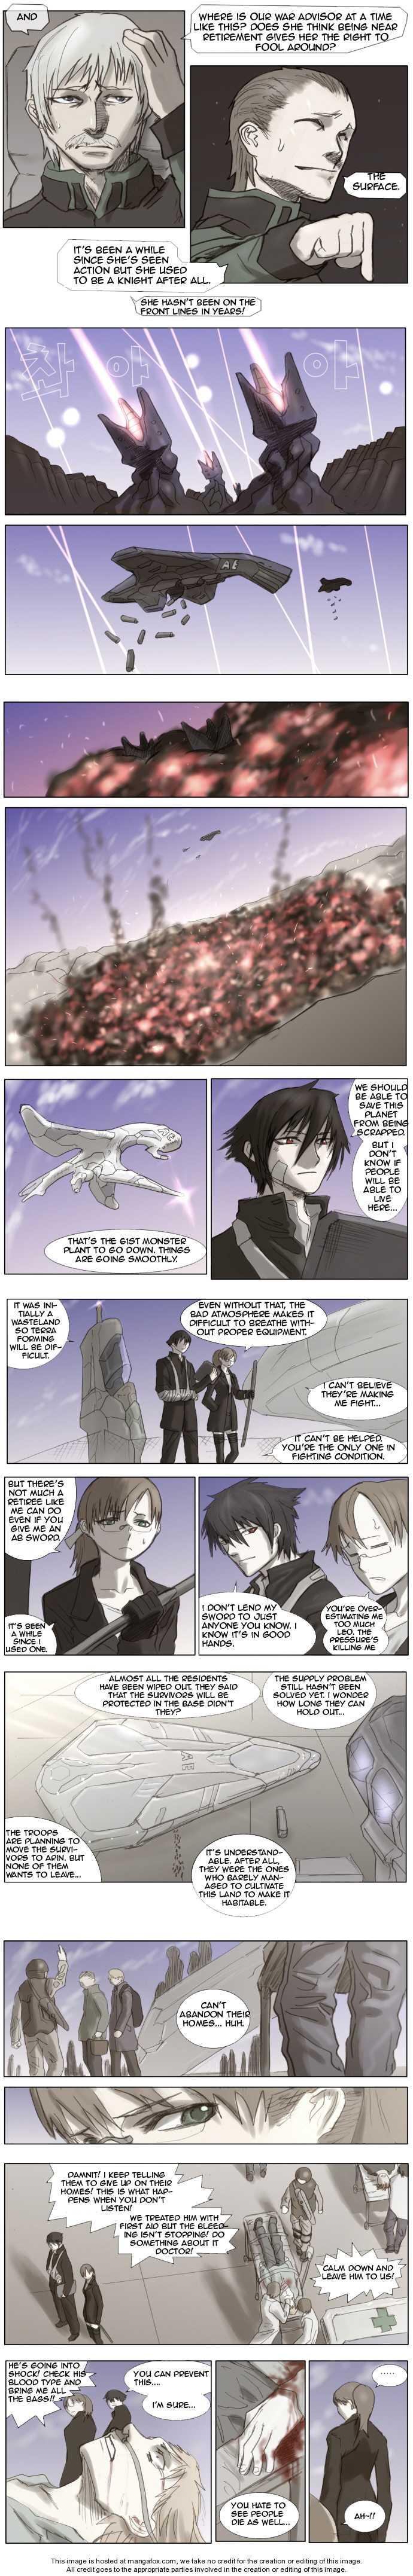 Knight Run 1 Page 2